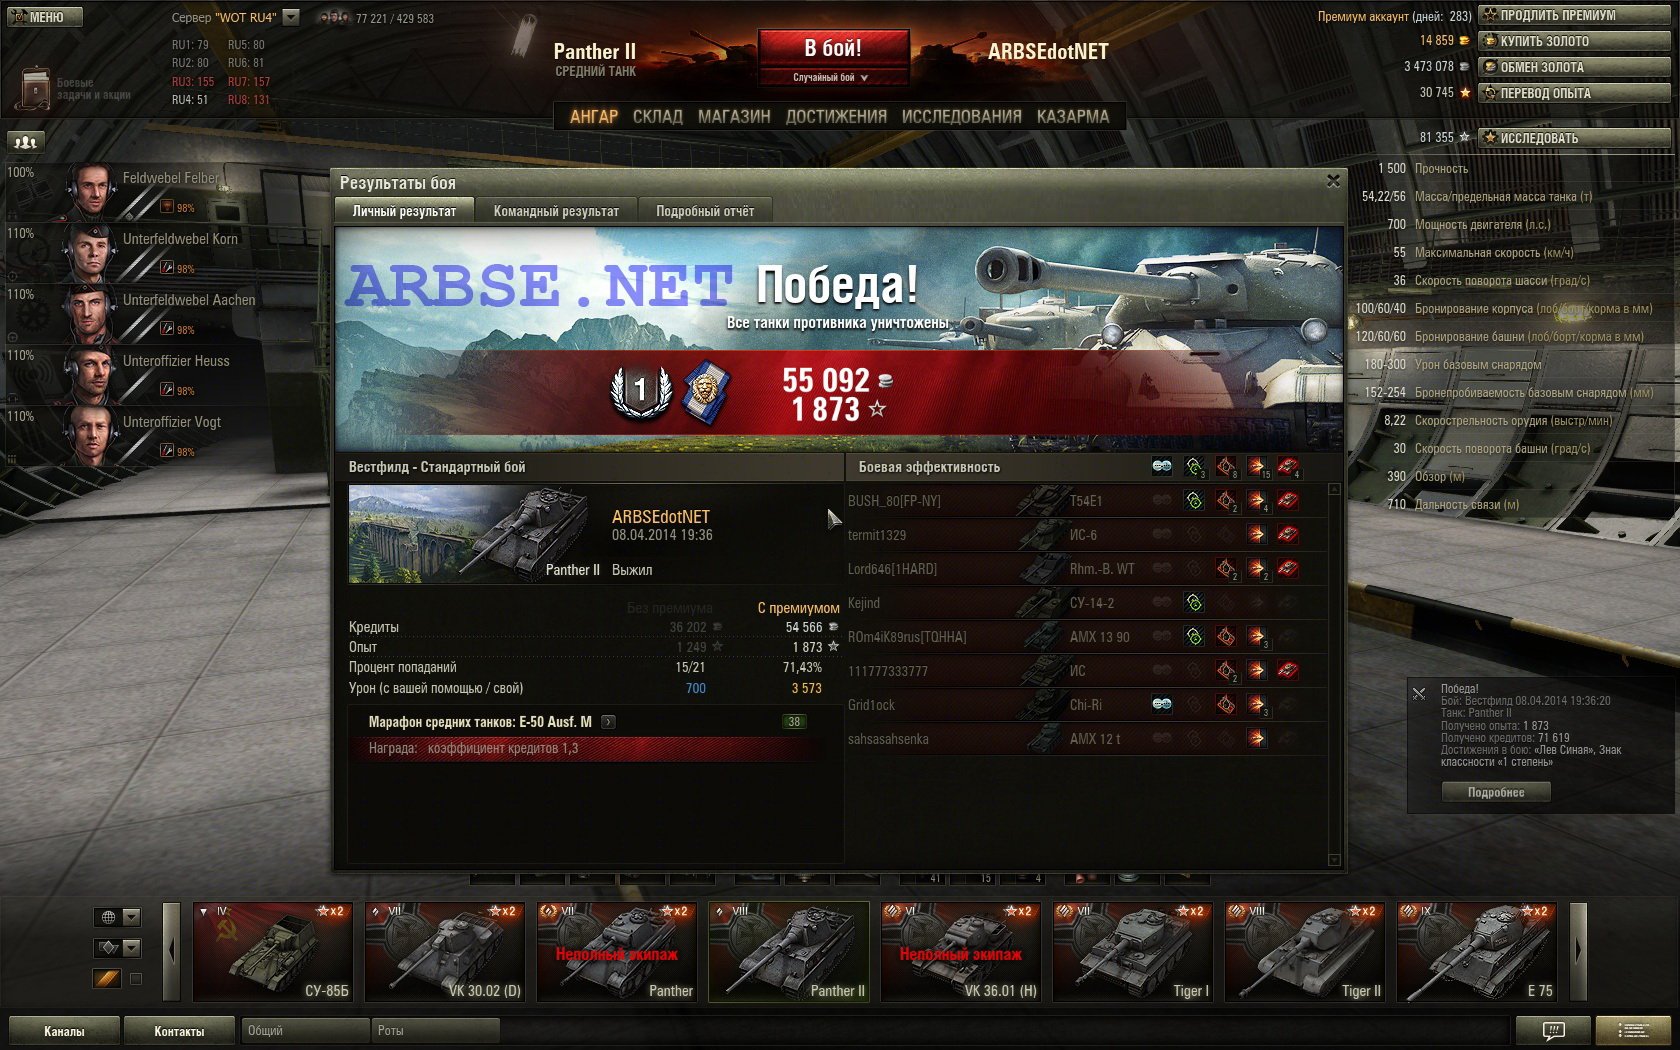 Действующий инвайт код на ворлд оф танк - 40f8e